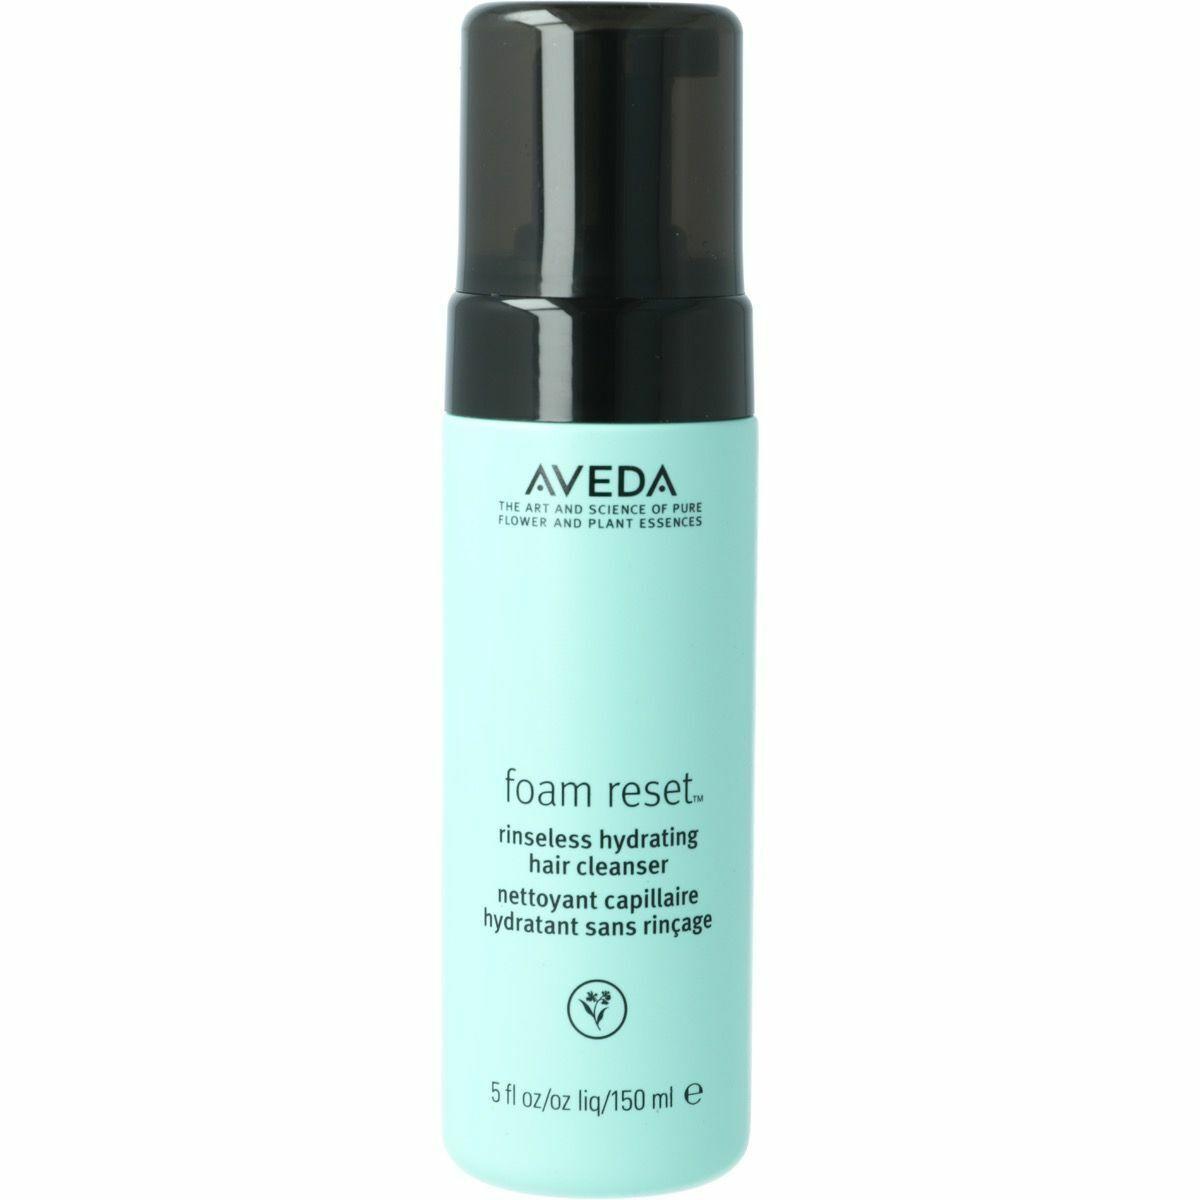 Aveda Foam Reset™ Rinseless Hydrating Hair Cleanser  Brand